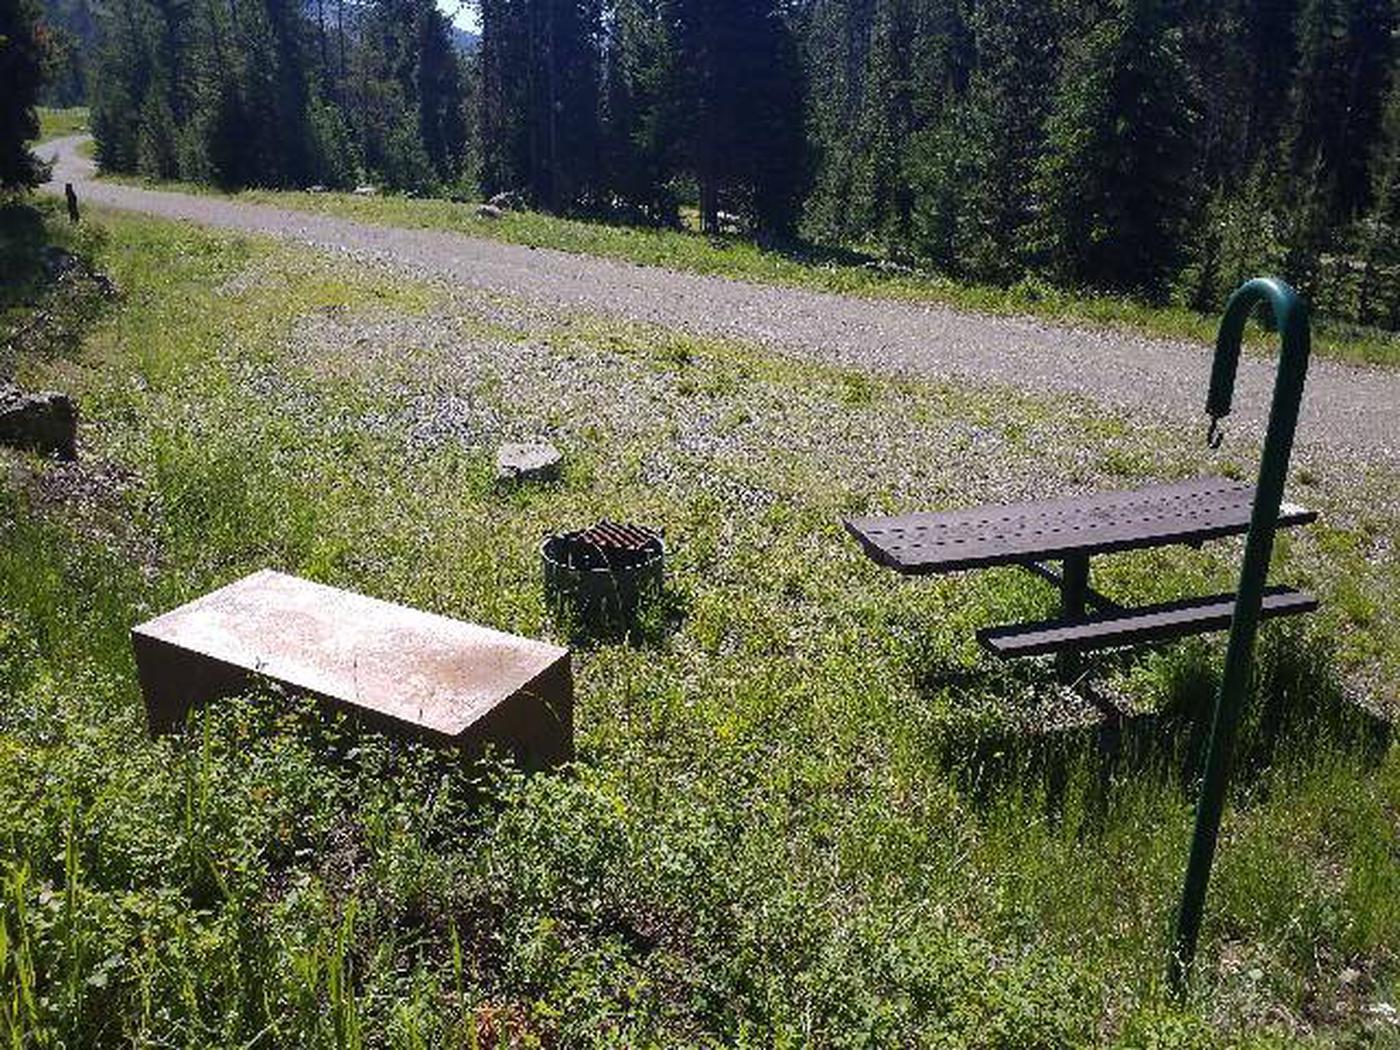 Threemile Campground Campsite 2 - Back View